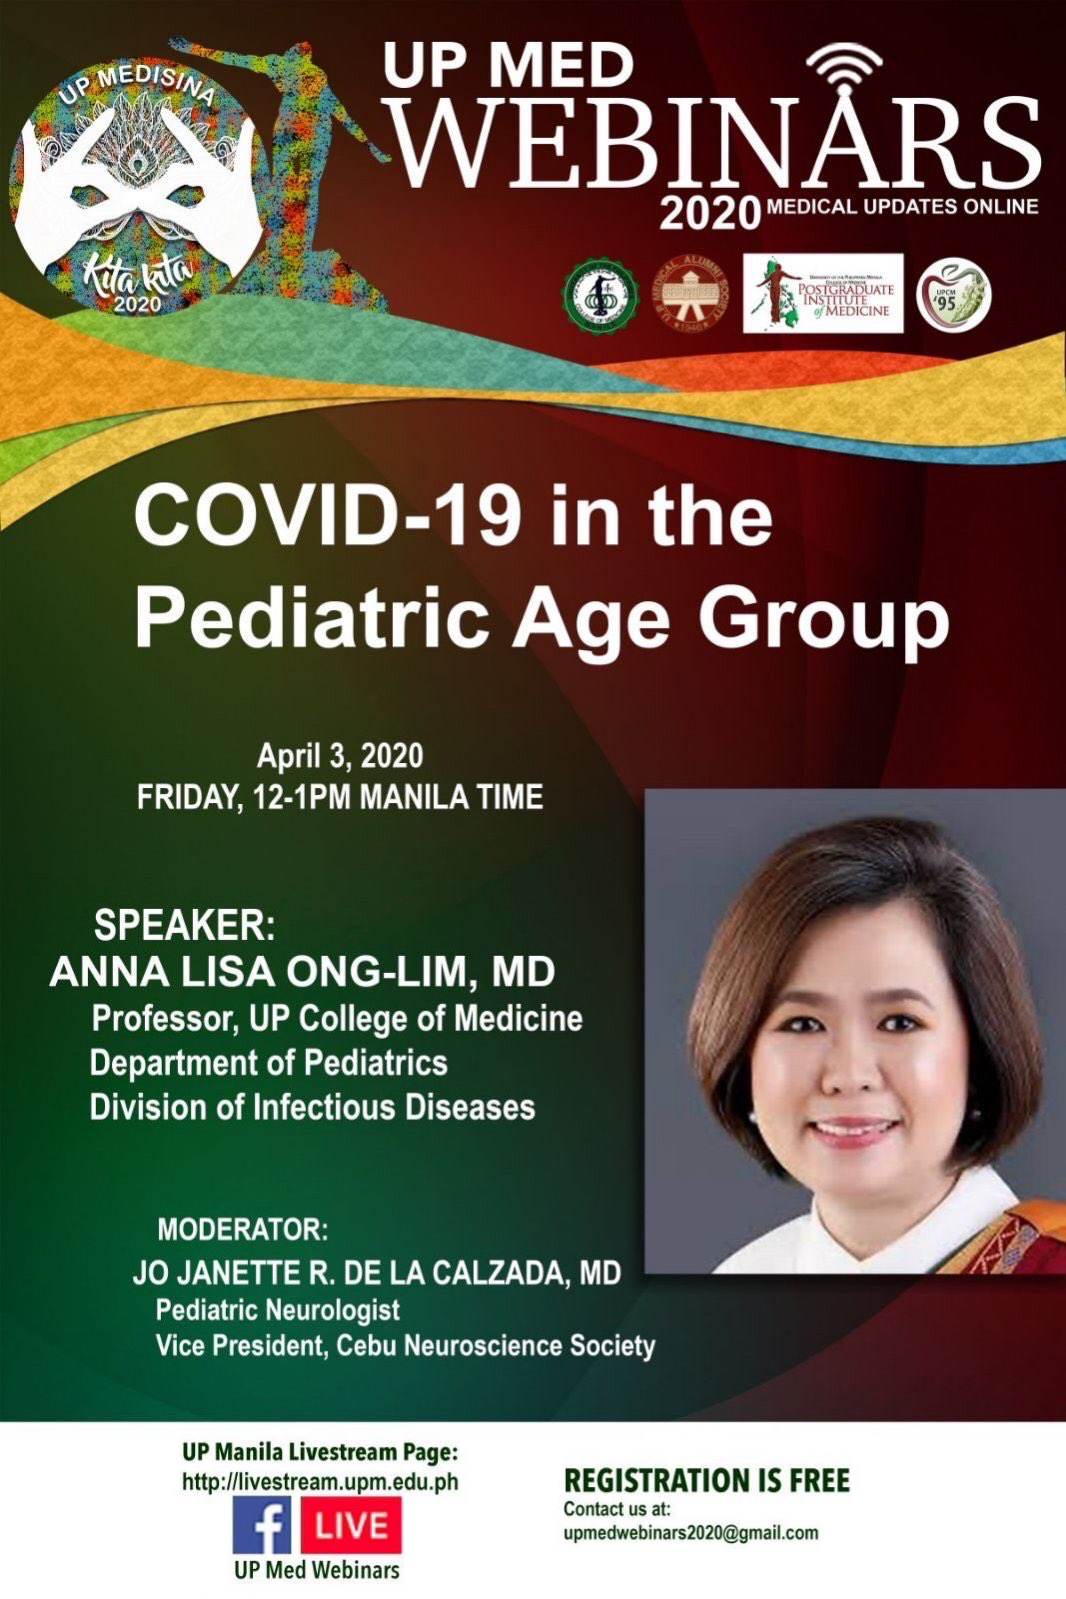 Dr. Anna Ong-Lim